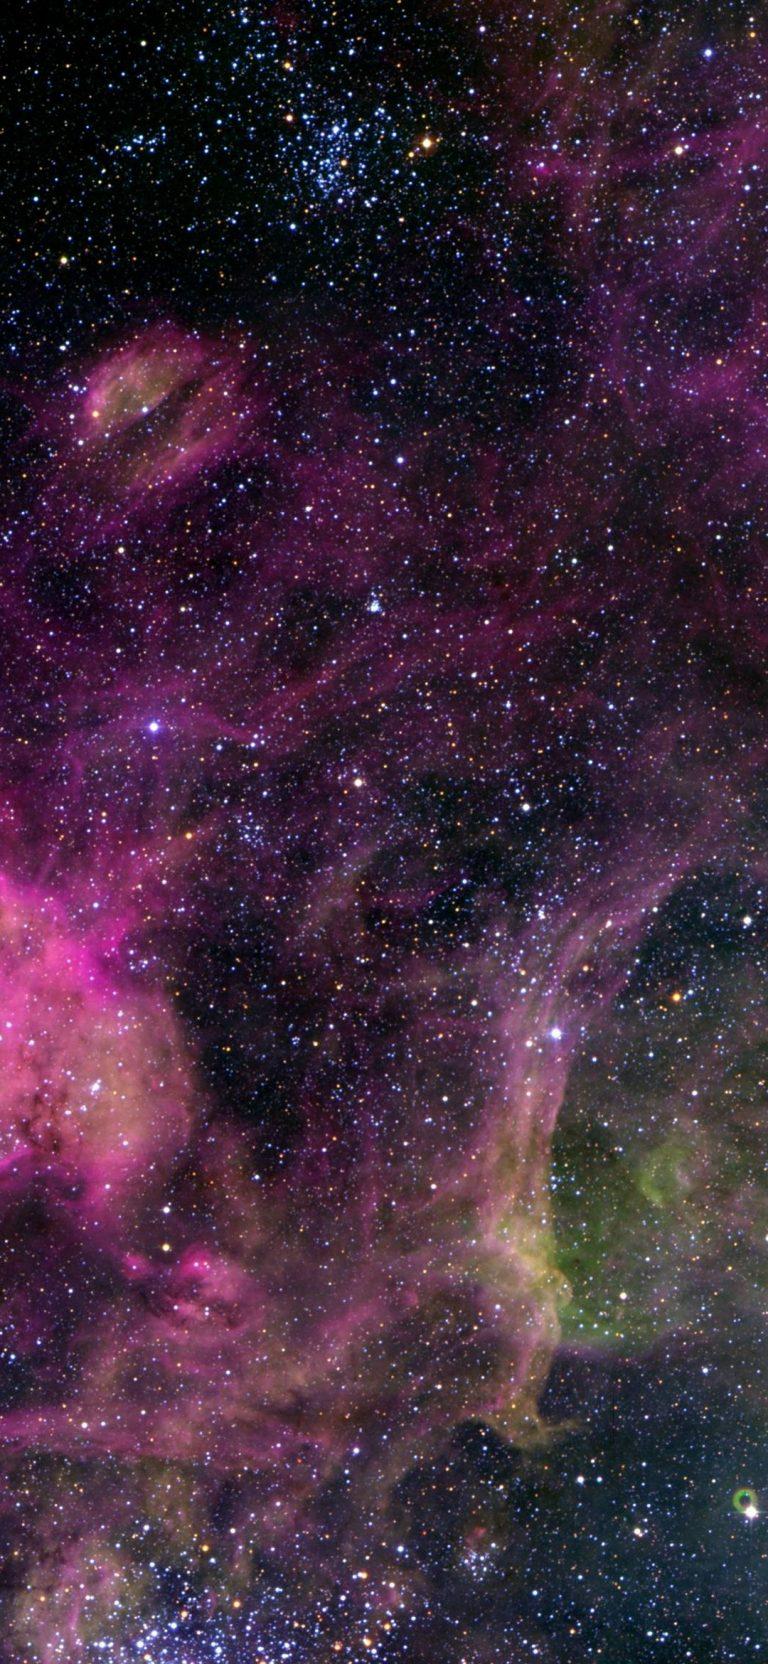 Space Phone Wallpaper 201 1080x2340 768x1664